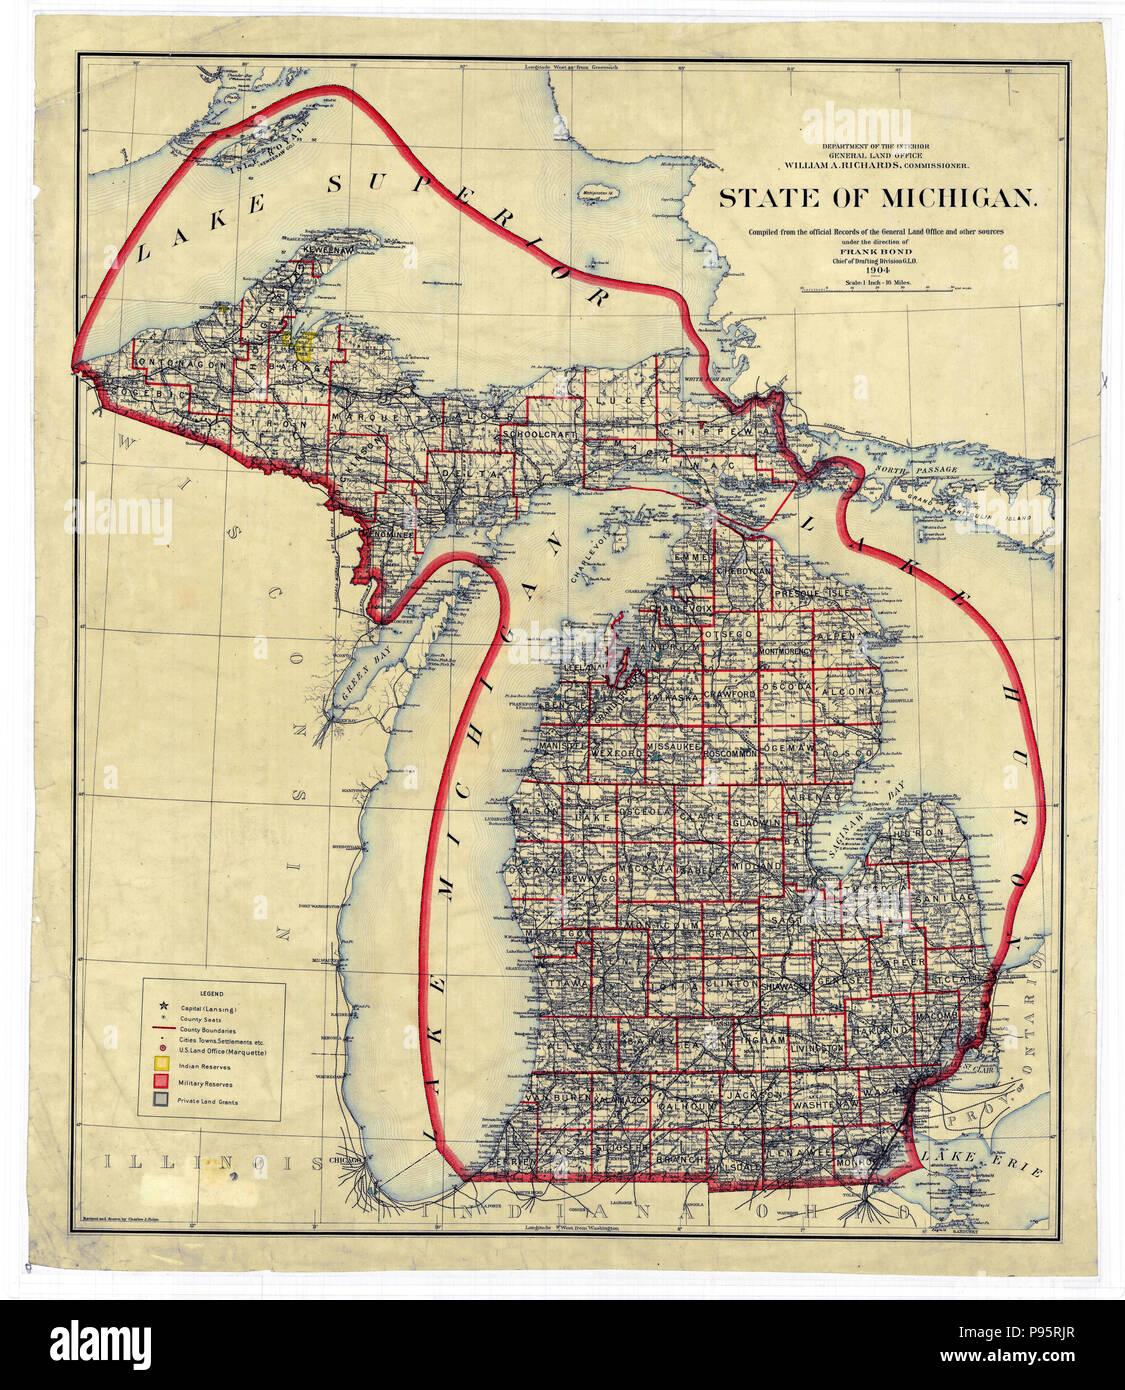 Vintage Michigan Map Stock Photos Vintage Michigan Map Stock